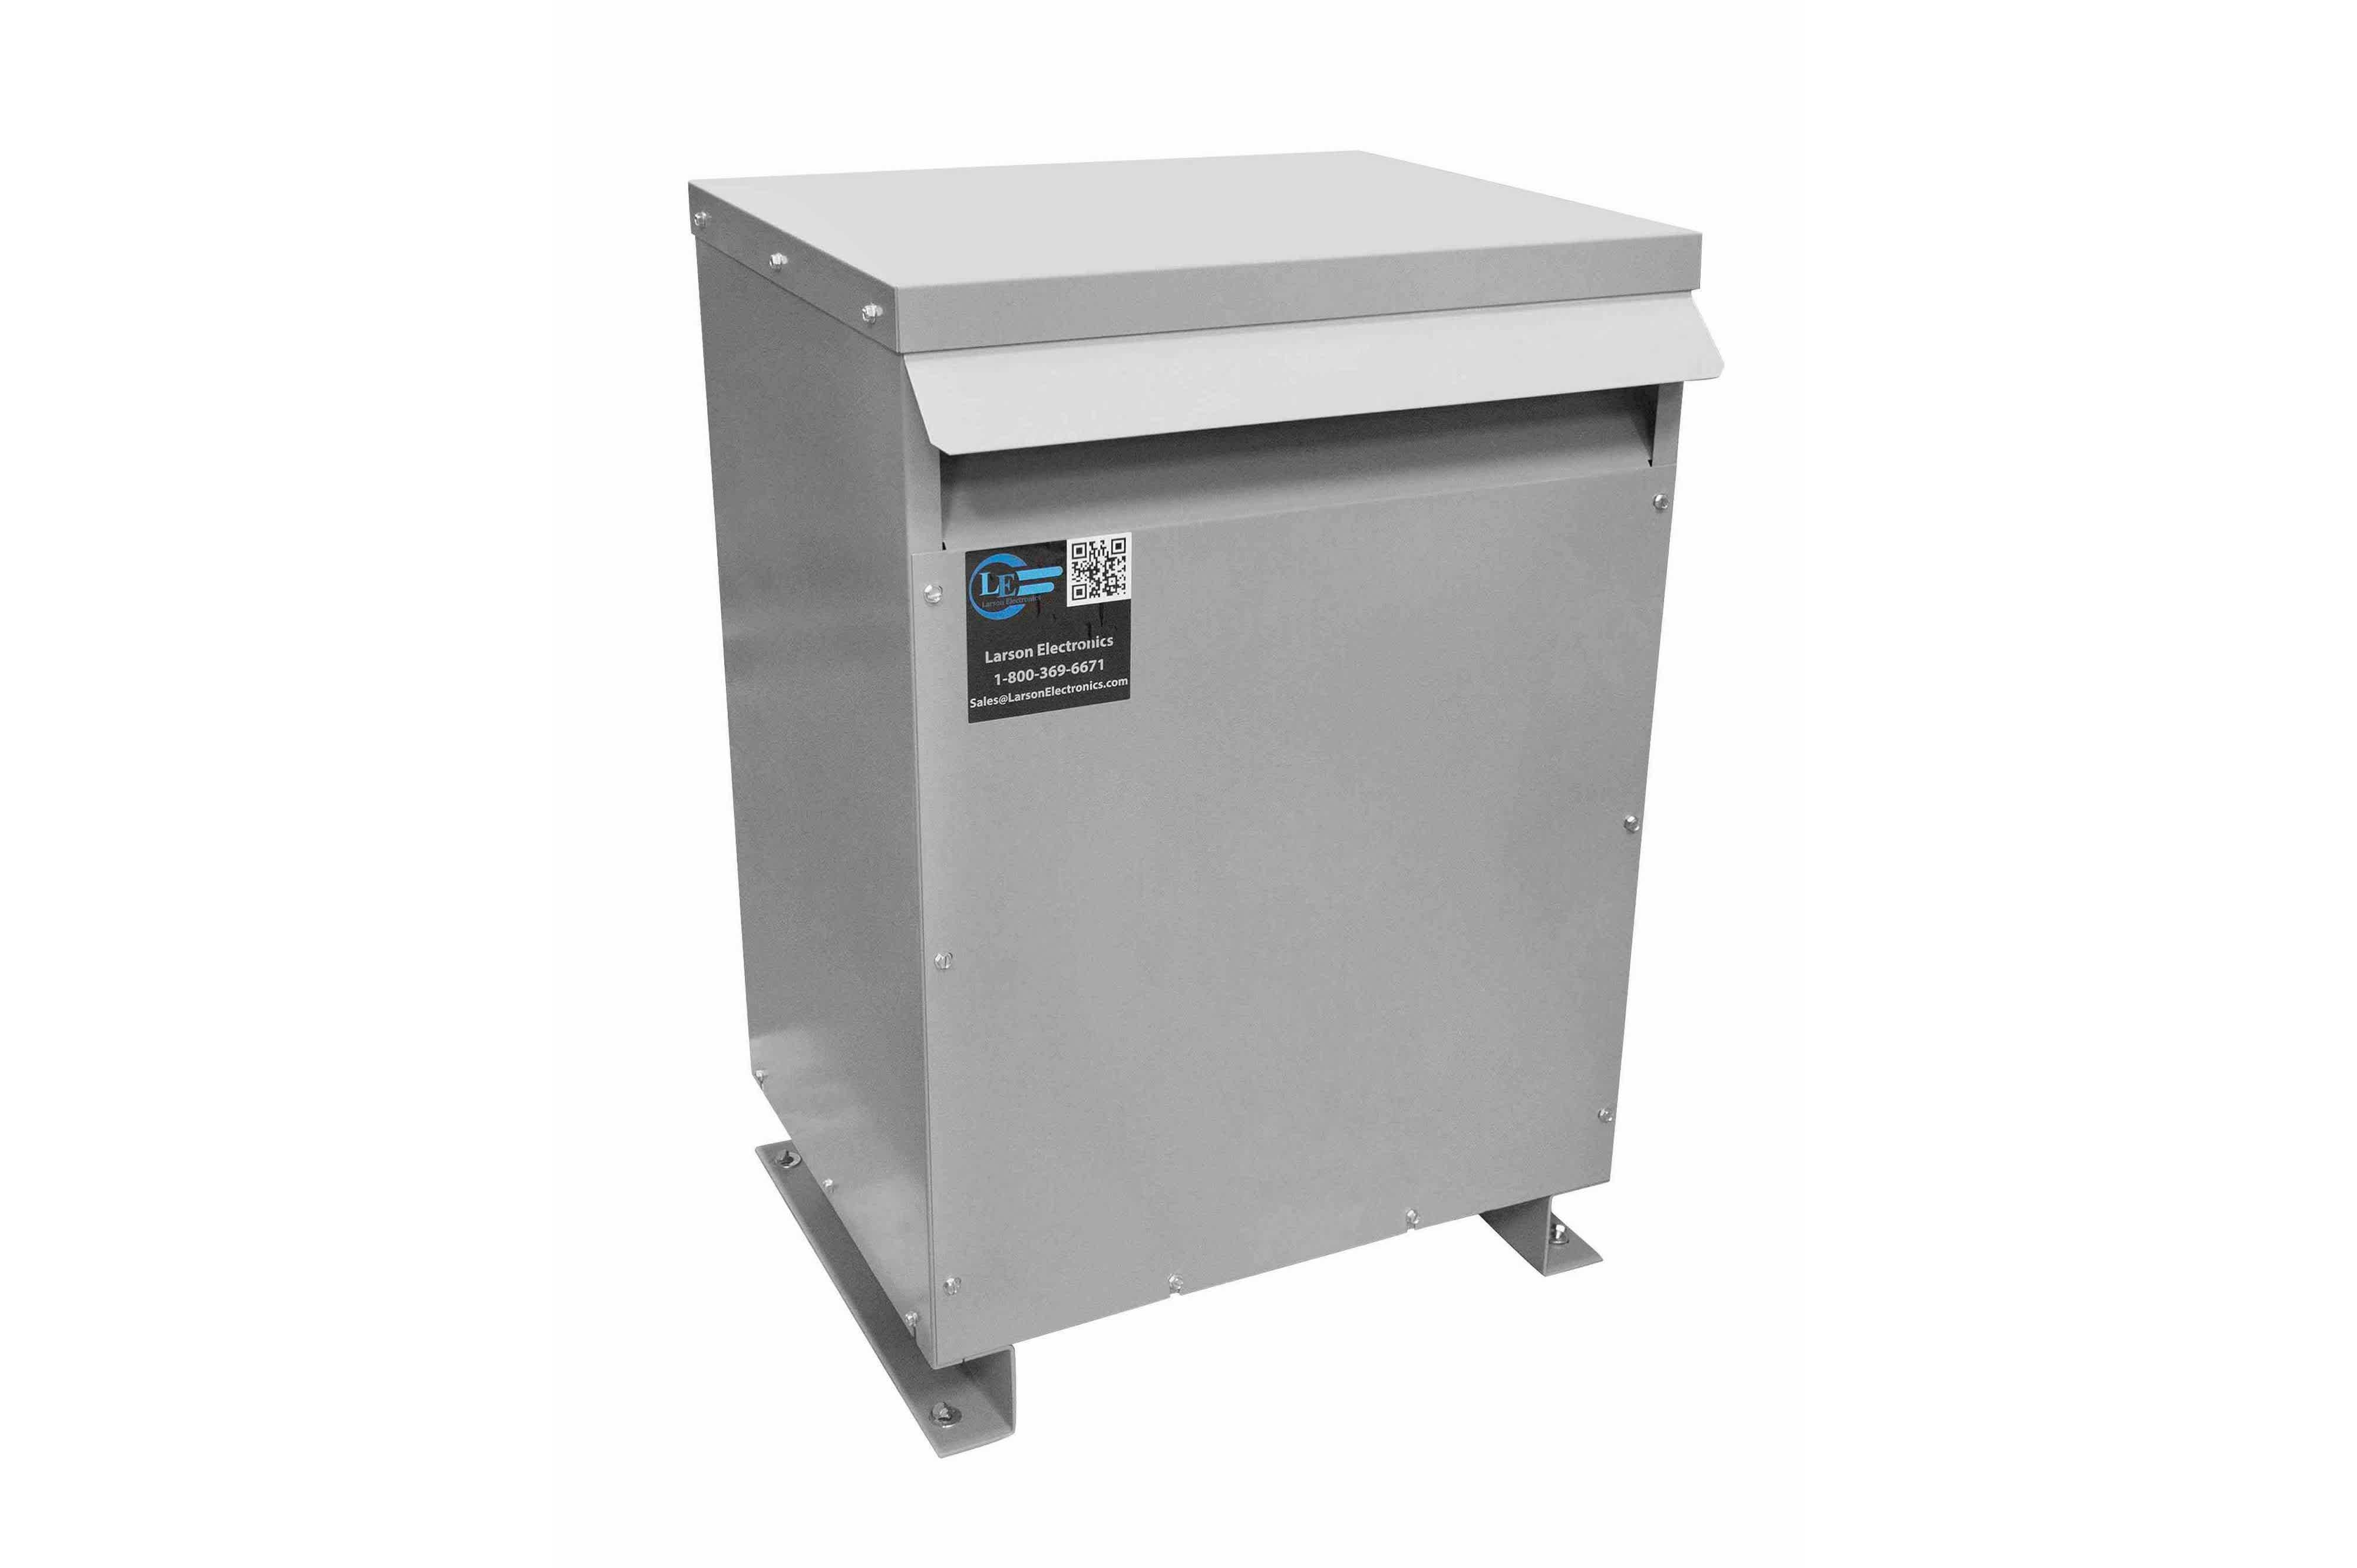 90 kVA 3PH Isolation Transformer, 480V Wye Primary, 240V/120 Delta Secondary, N3R, Ventilated, 60 Hz